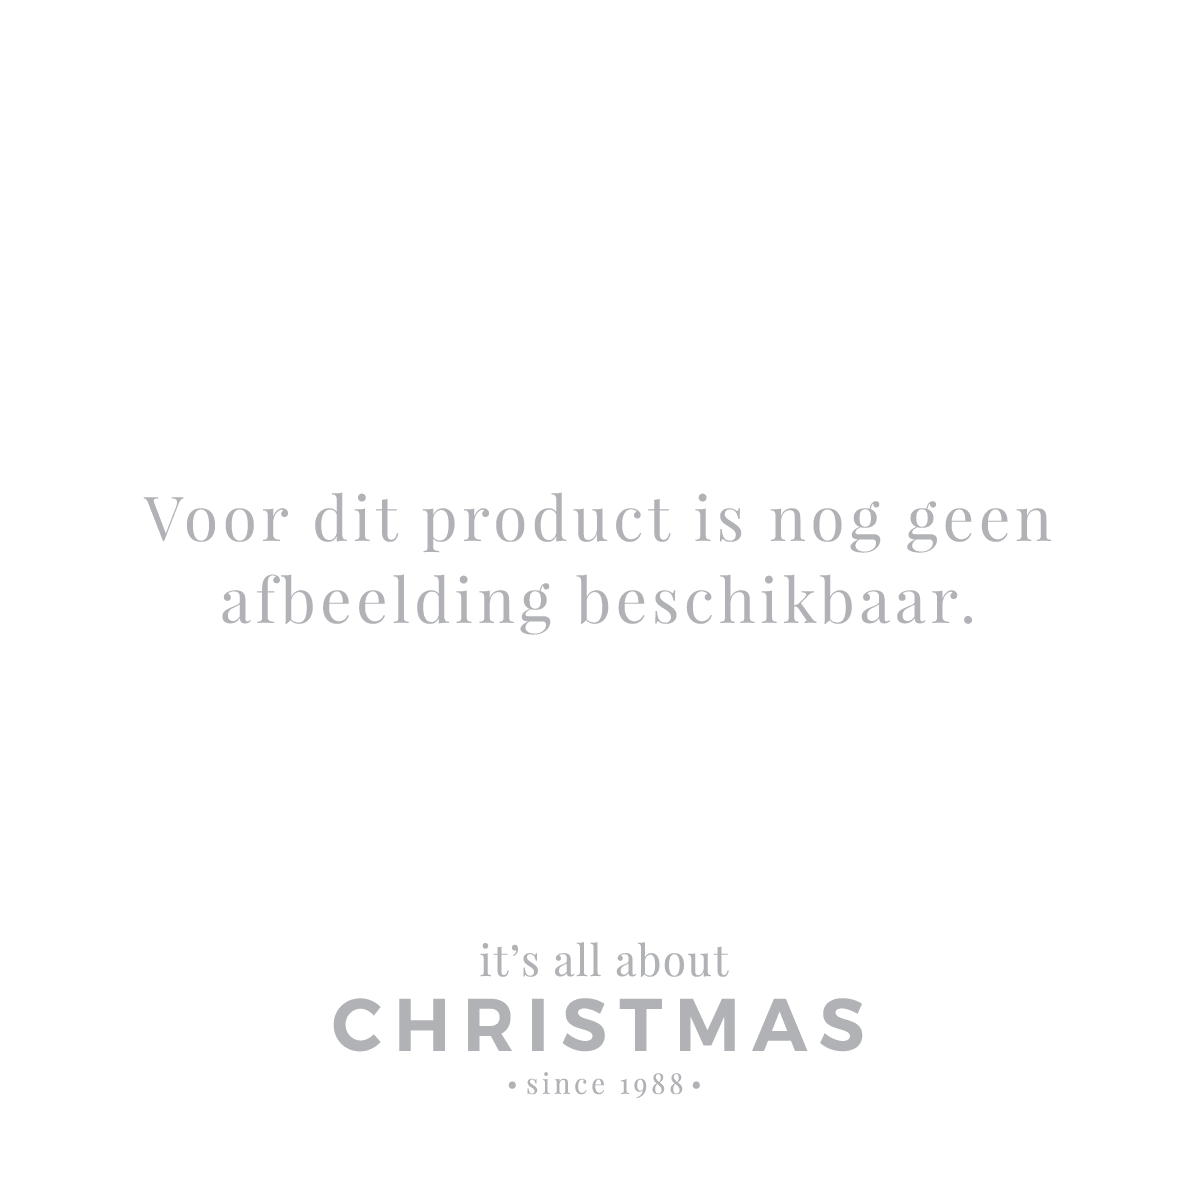 Christbaumkugeln Kunststoff Weiß.18 Kunststoff Christbaumkugeln Weiß Mix 4cm It S All About Christmas